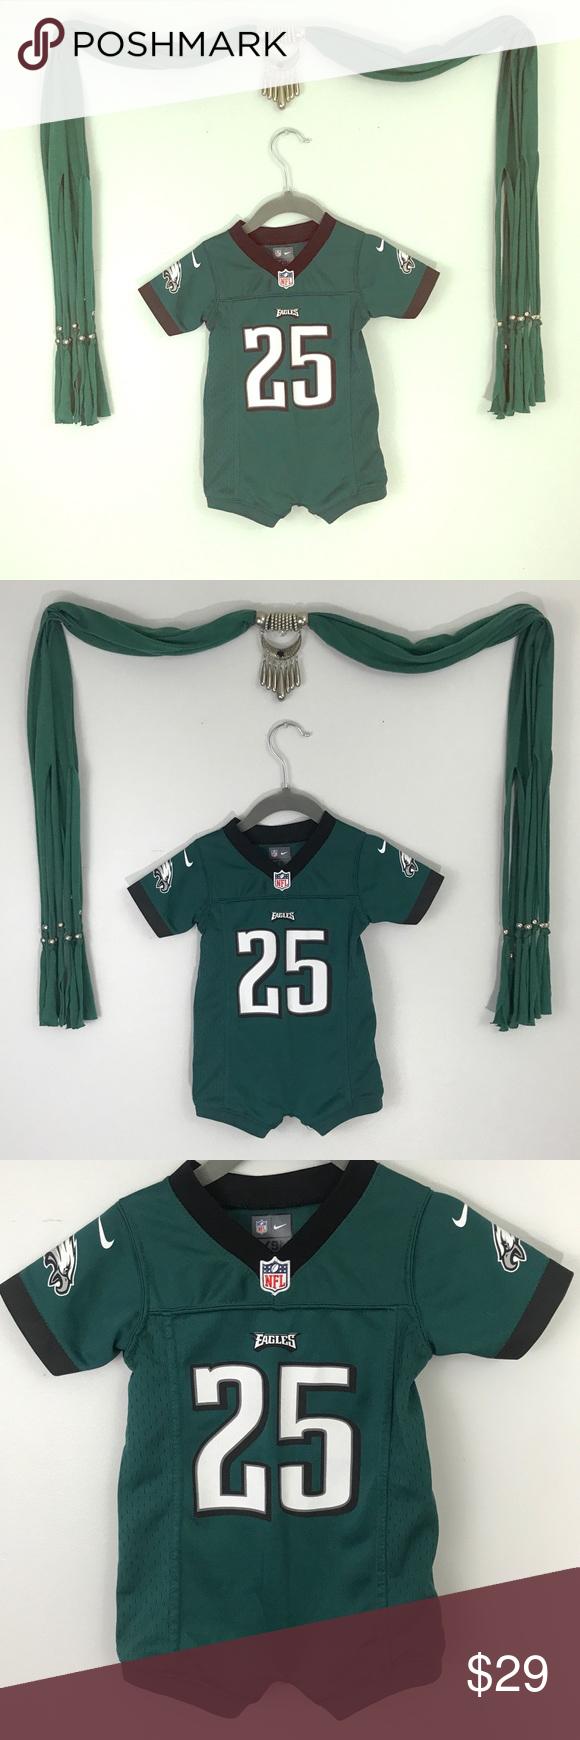 philadelphia eagles mccoy jersey